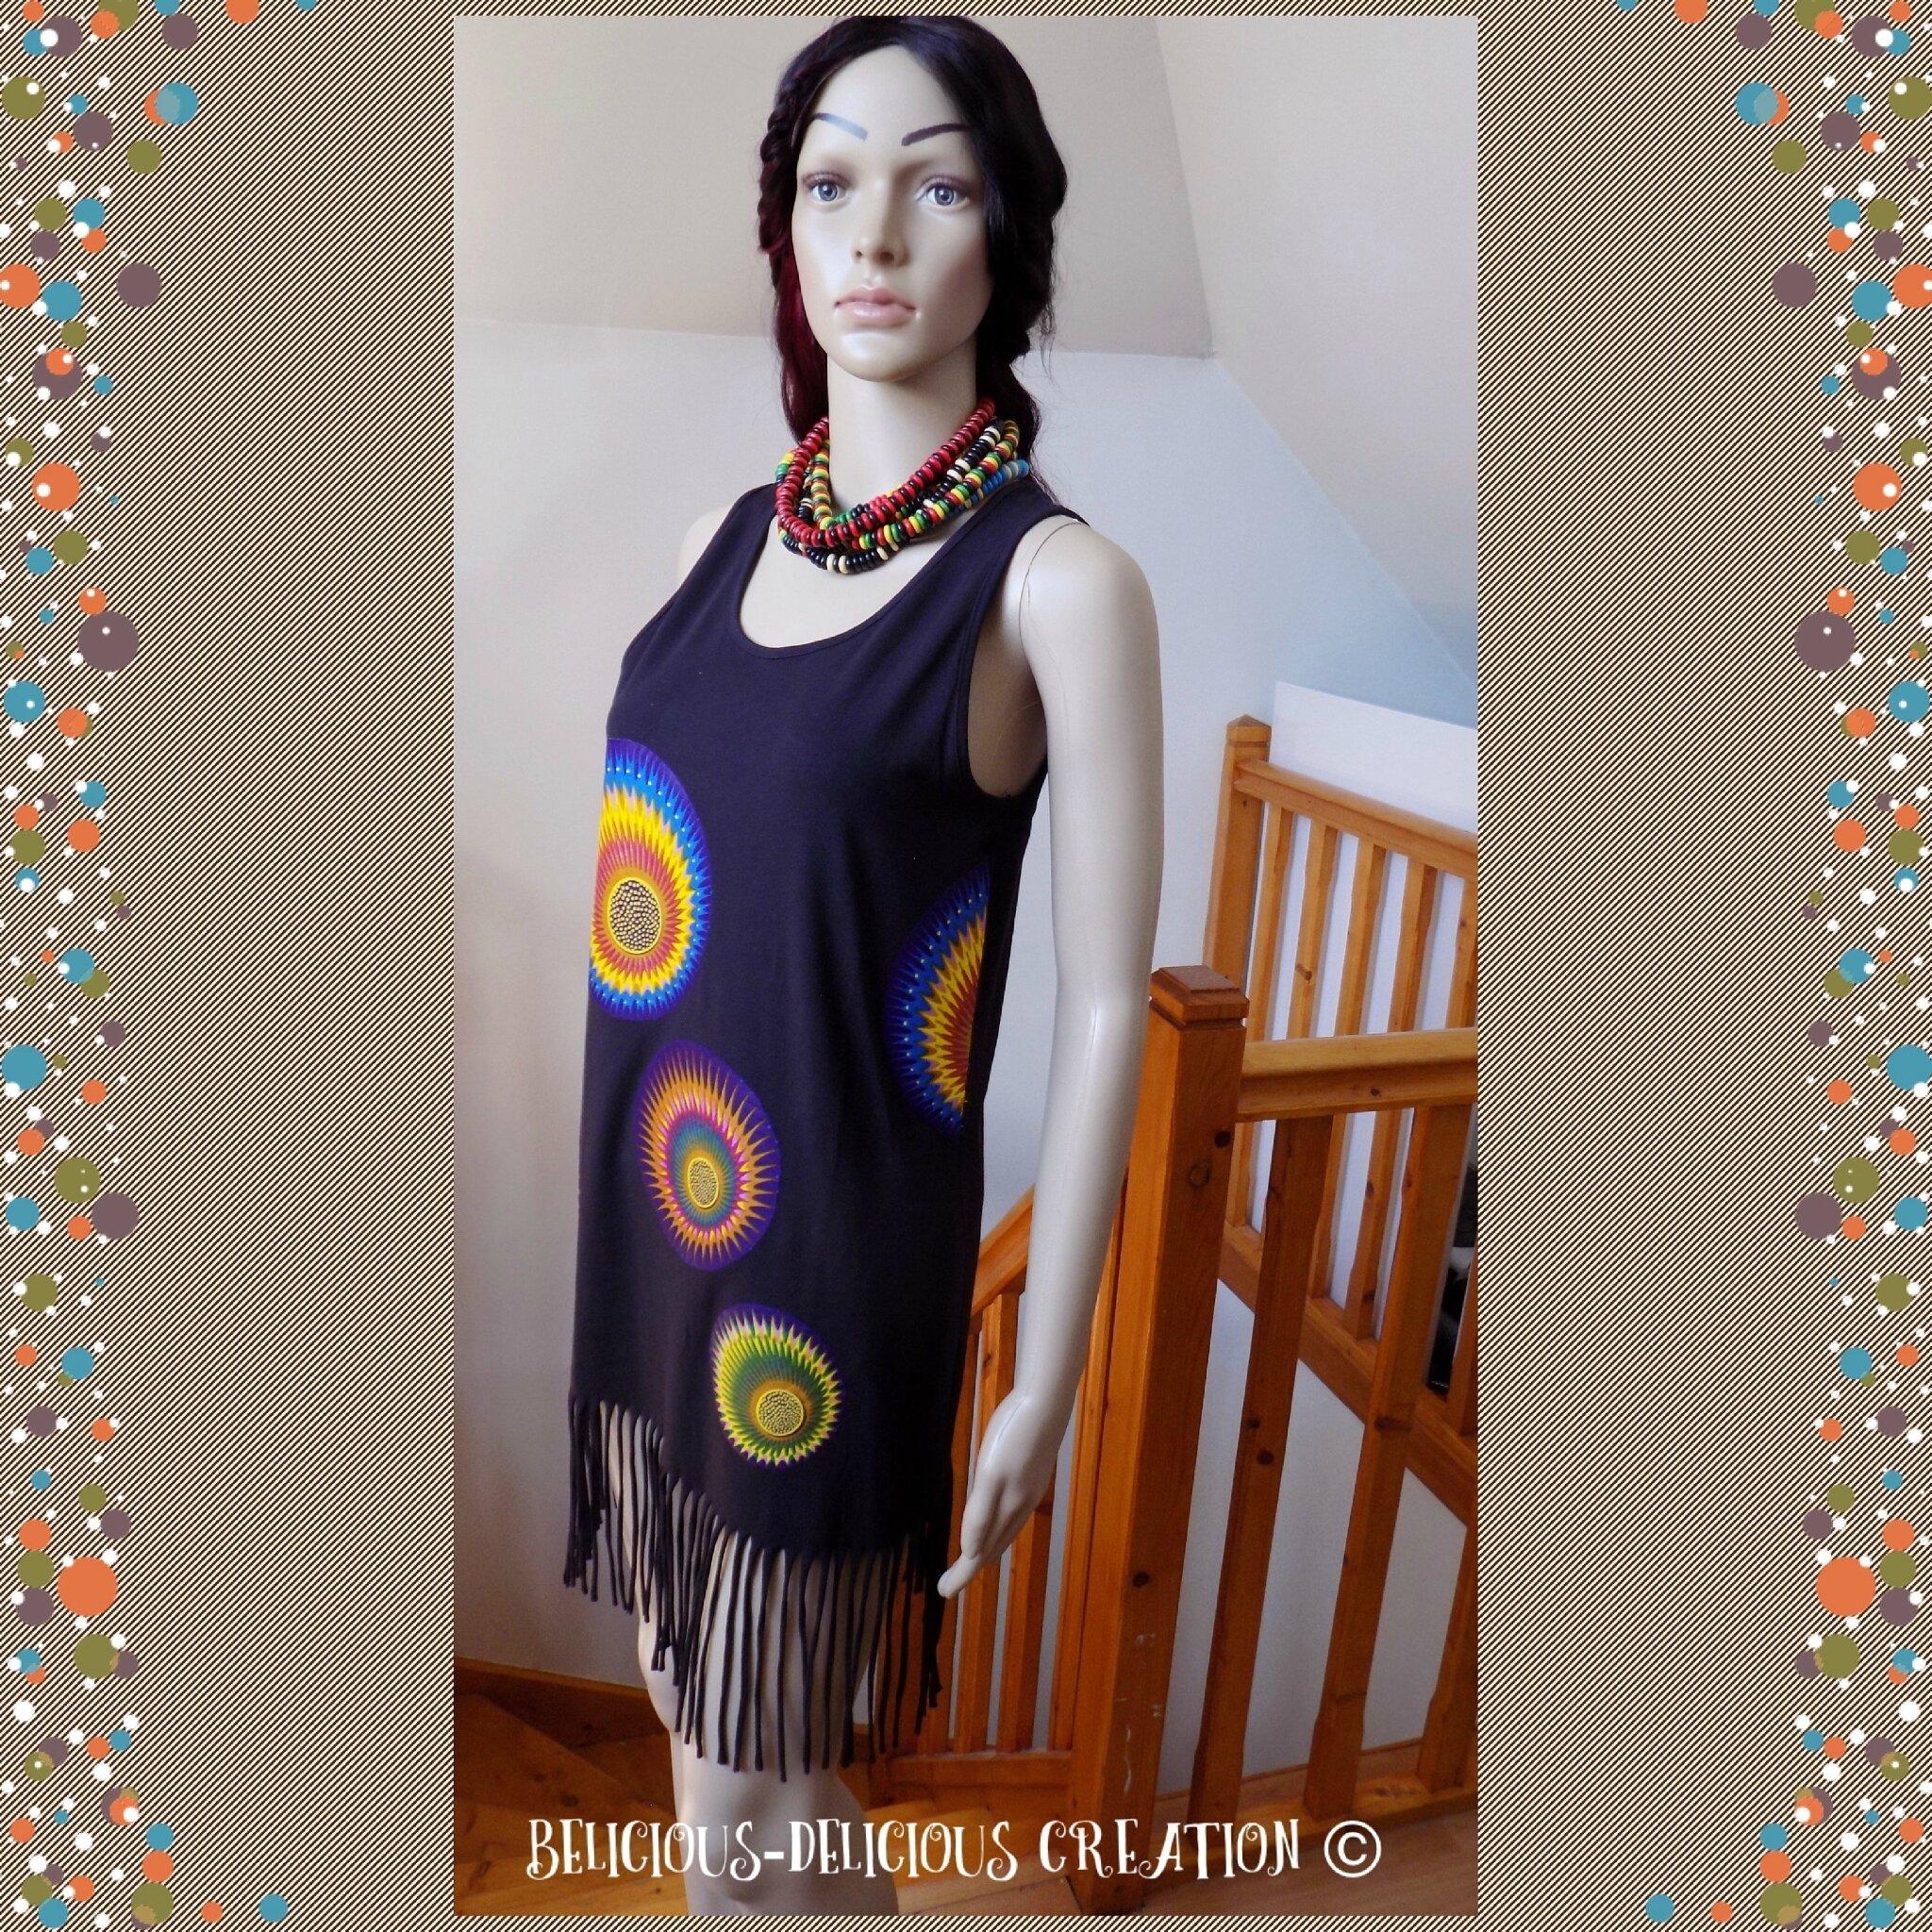 Originale Top !! AFROWAX !! en coton noir/multicolore, Long 88cm Taille: 38/40 belicious-delicious-creation